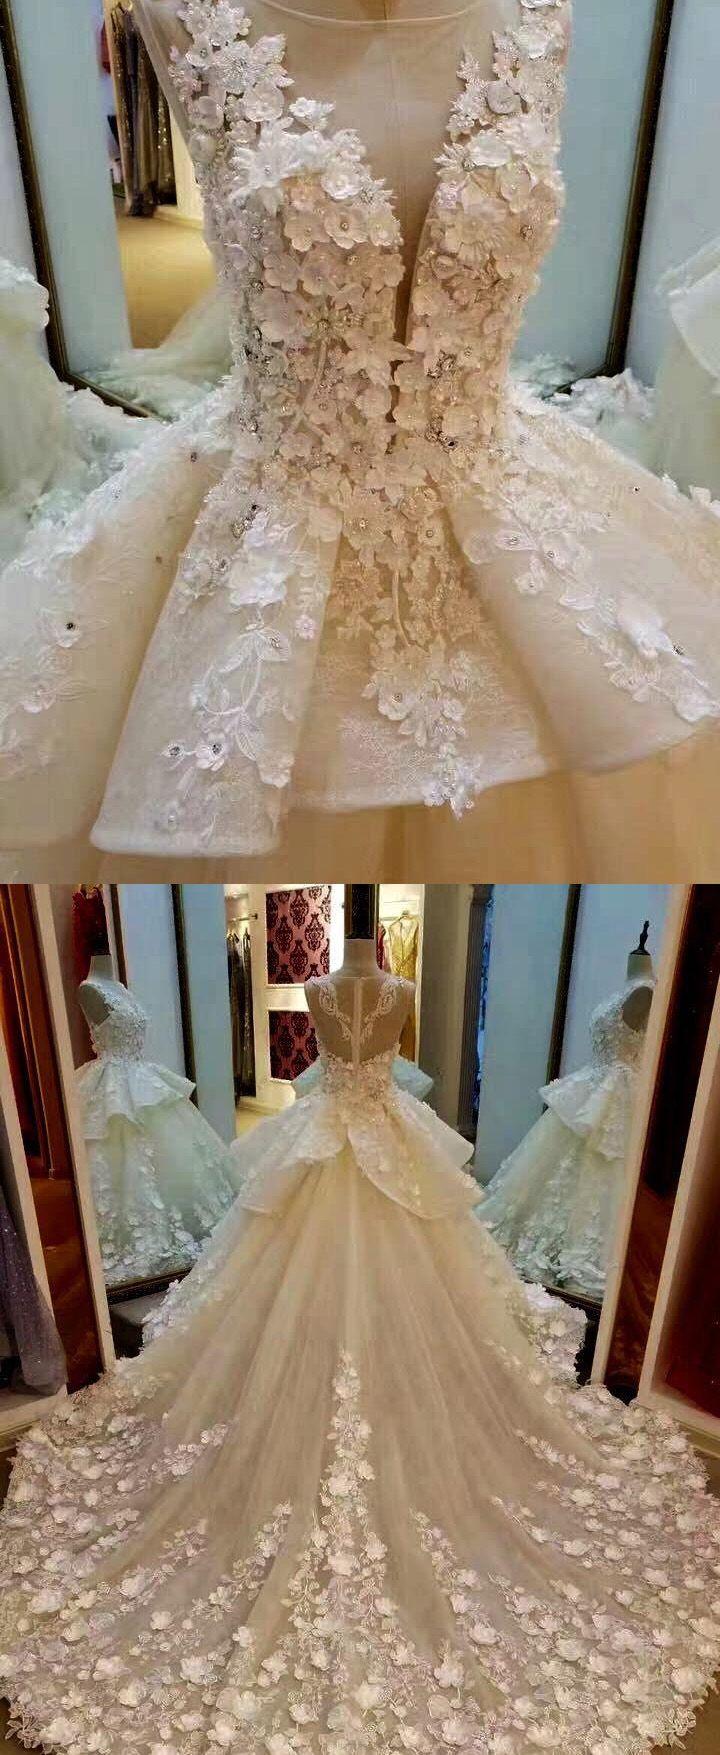 Sleeveless wedding dresses white sleeveless wedding dresses long